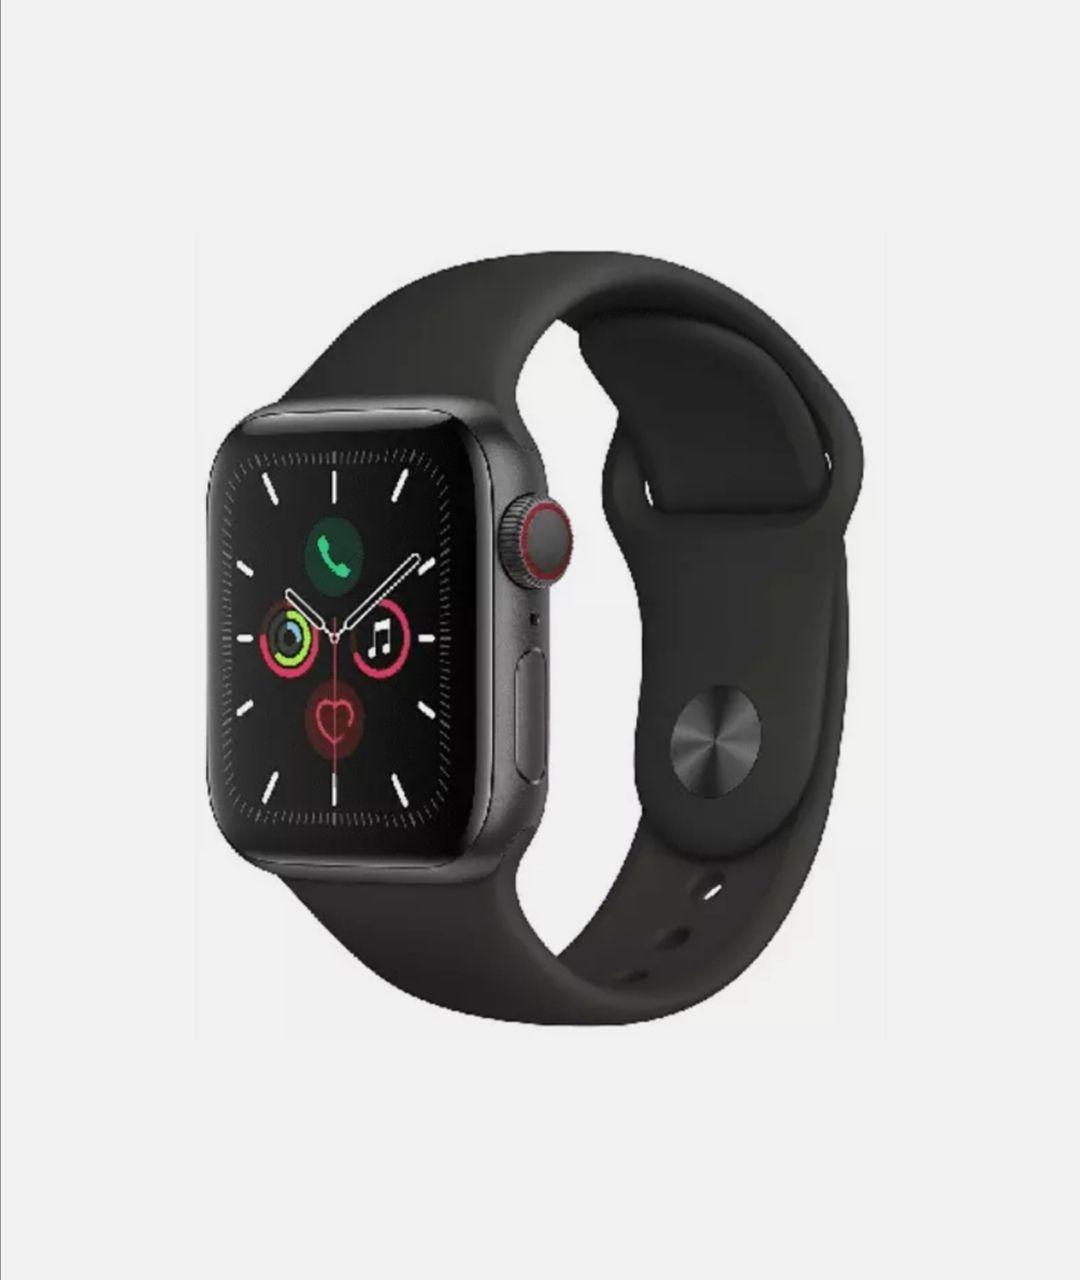 Apple Watch Series 5, Chip W3, 40 mm, GPS + Cellular